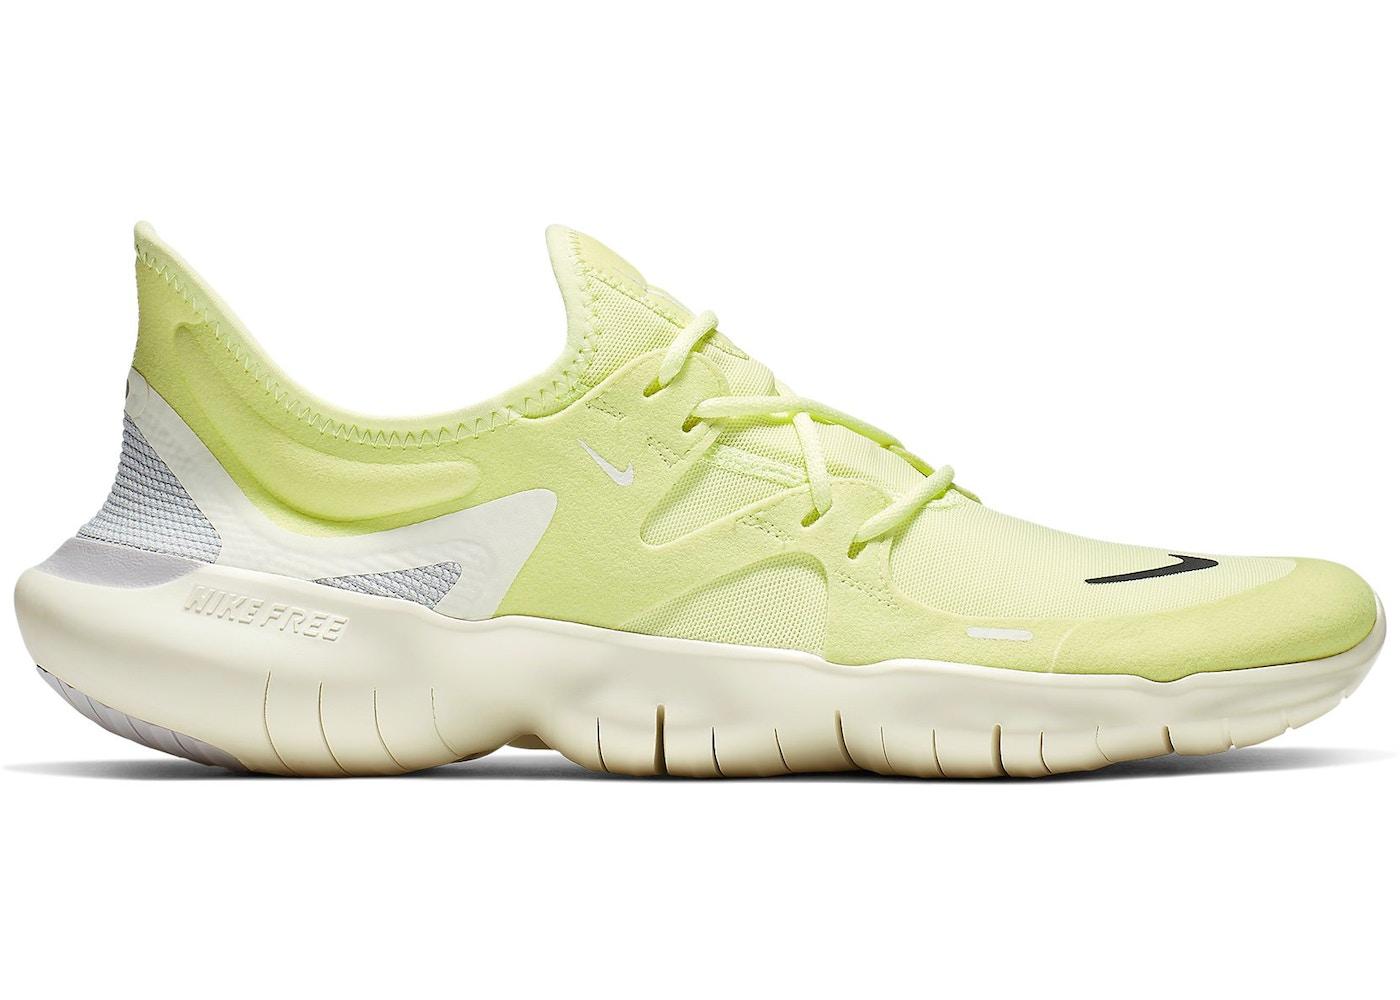 88969ef1a74ef Nike Free RN 5.0 Luminous Green Sail - AQ1289-300